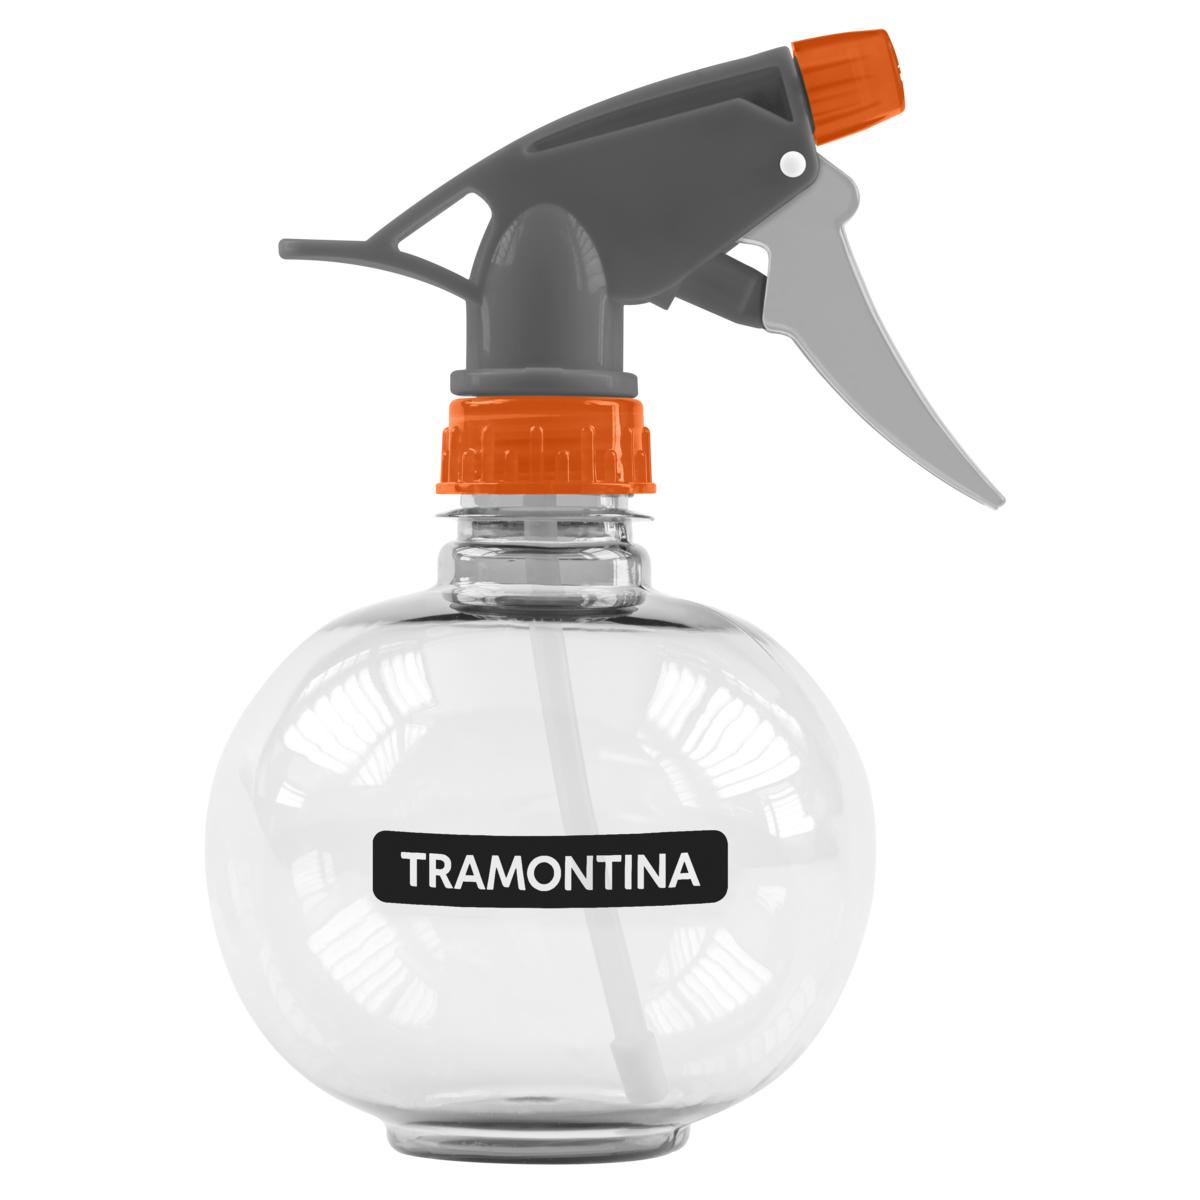 Pulverizador Manual Tramontina 0,45 L